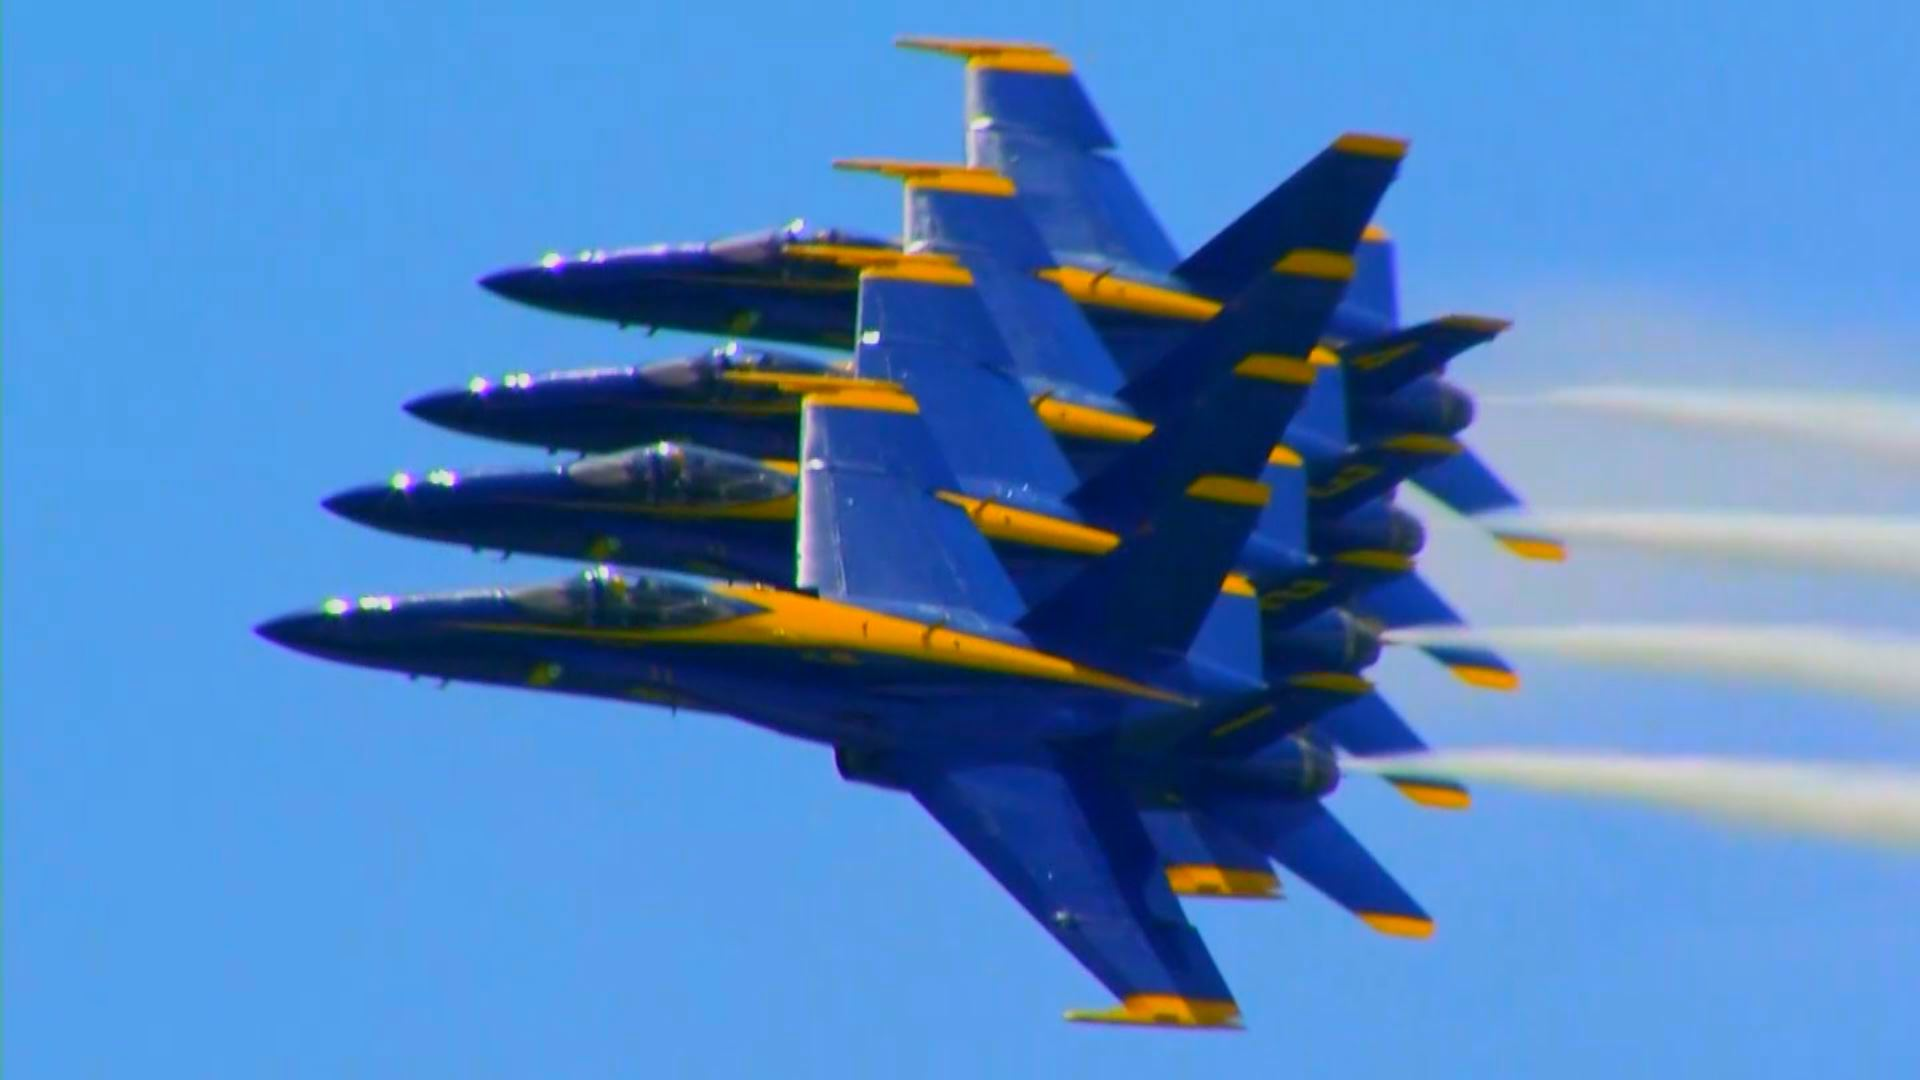 Blue_Angels_1532096410040.jpg